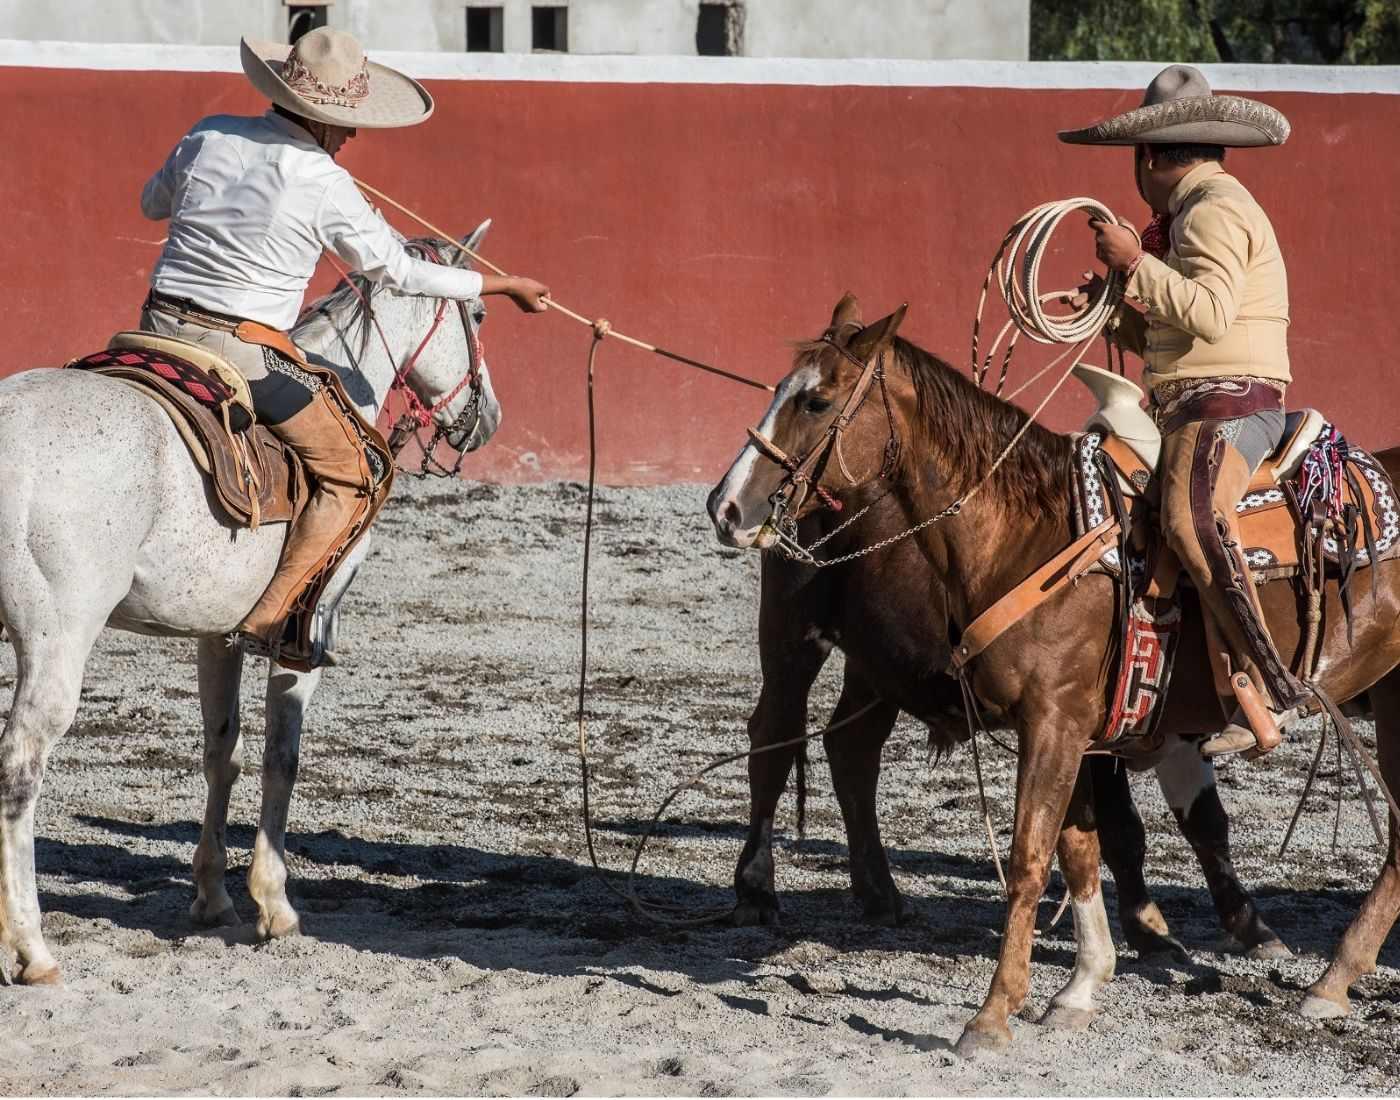 Charreria national sport of Mexico